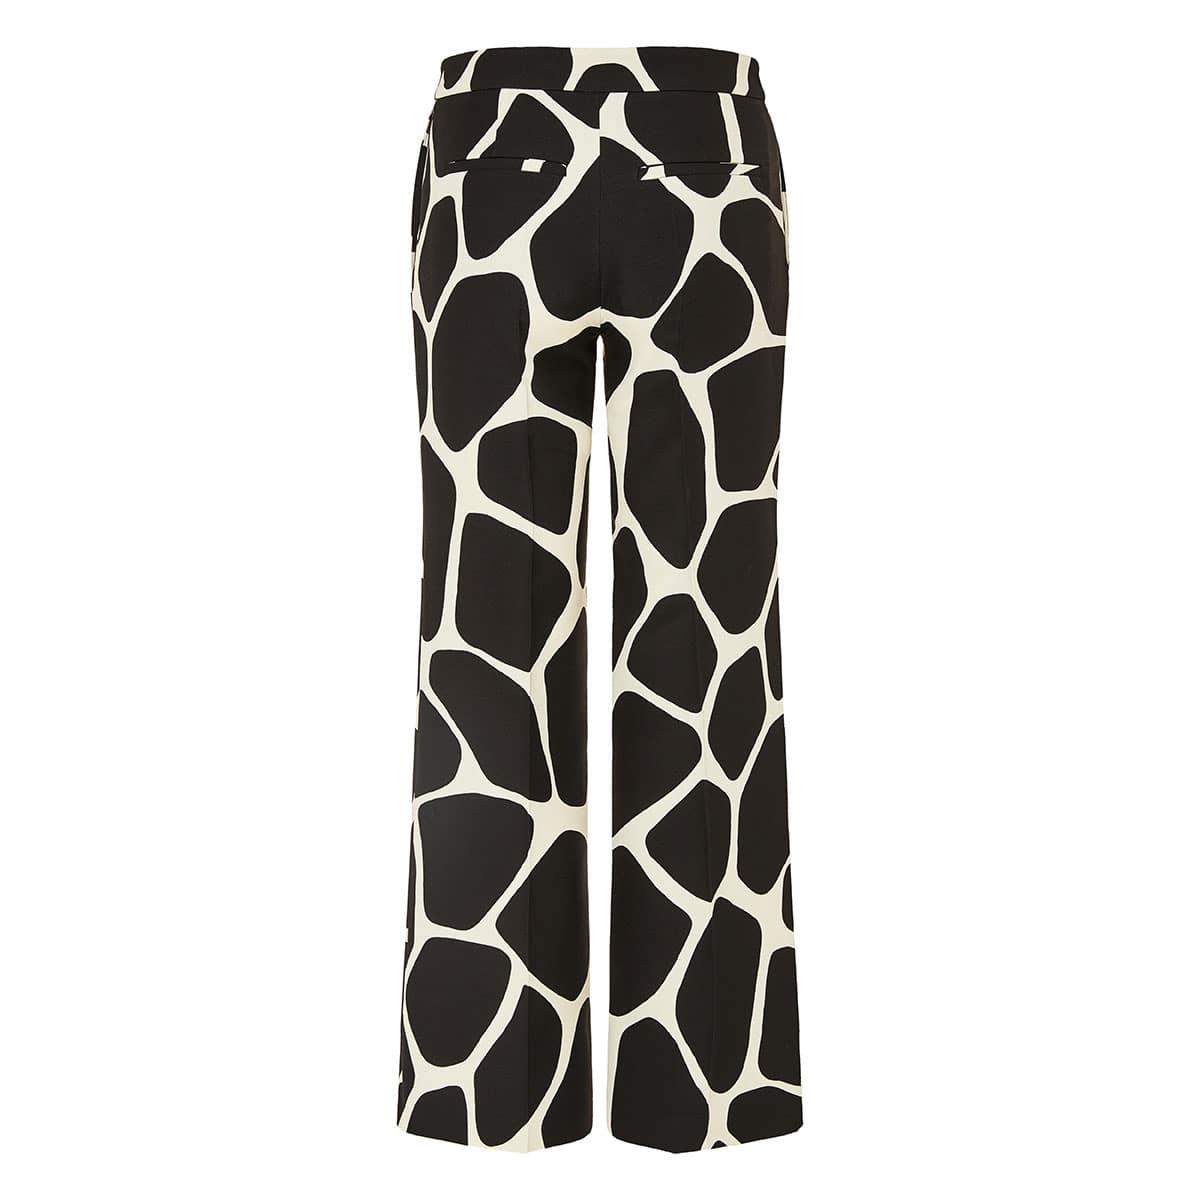 Giraffe printed wide-leg trousers